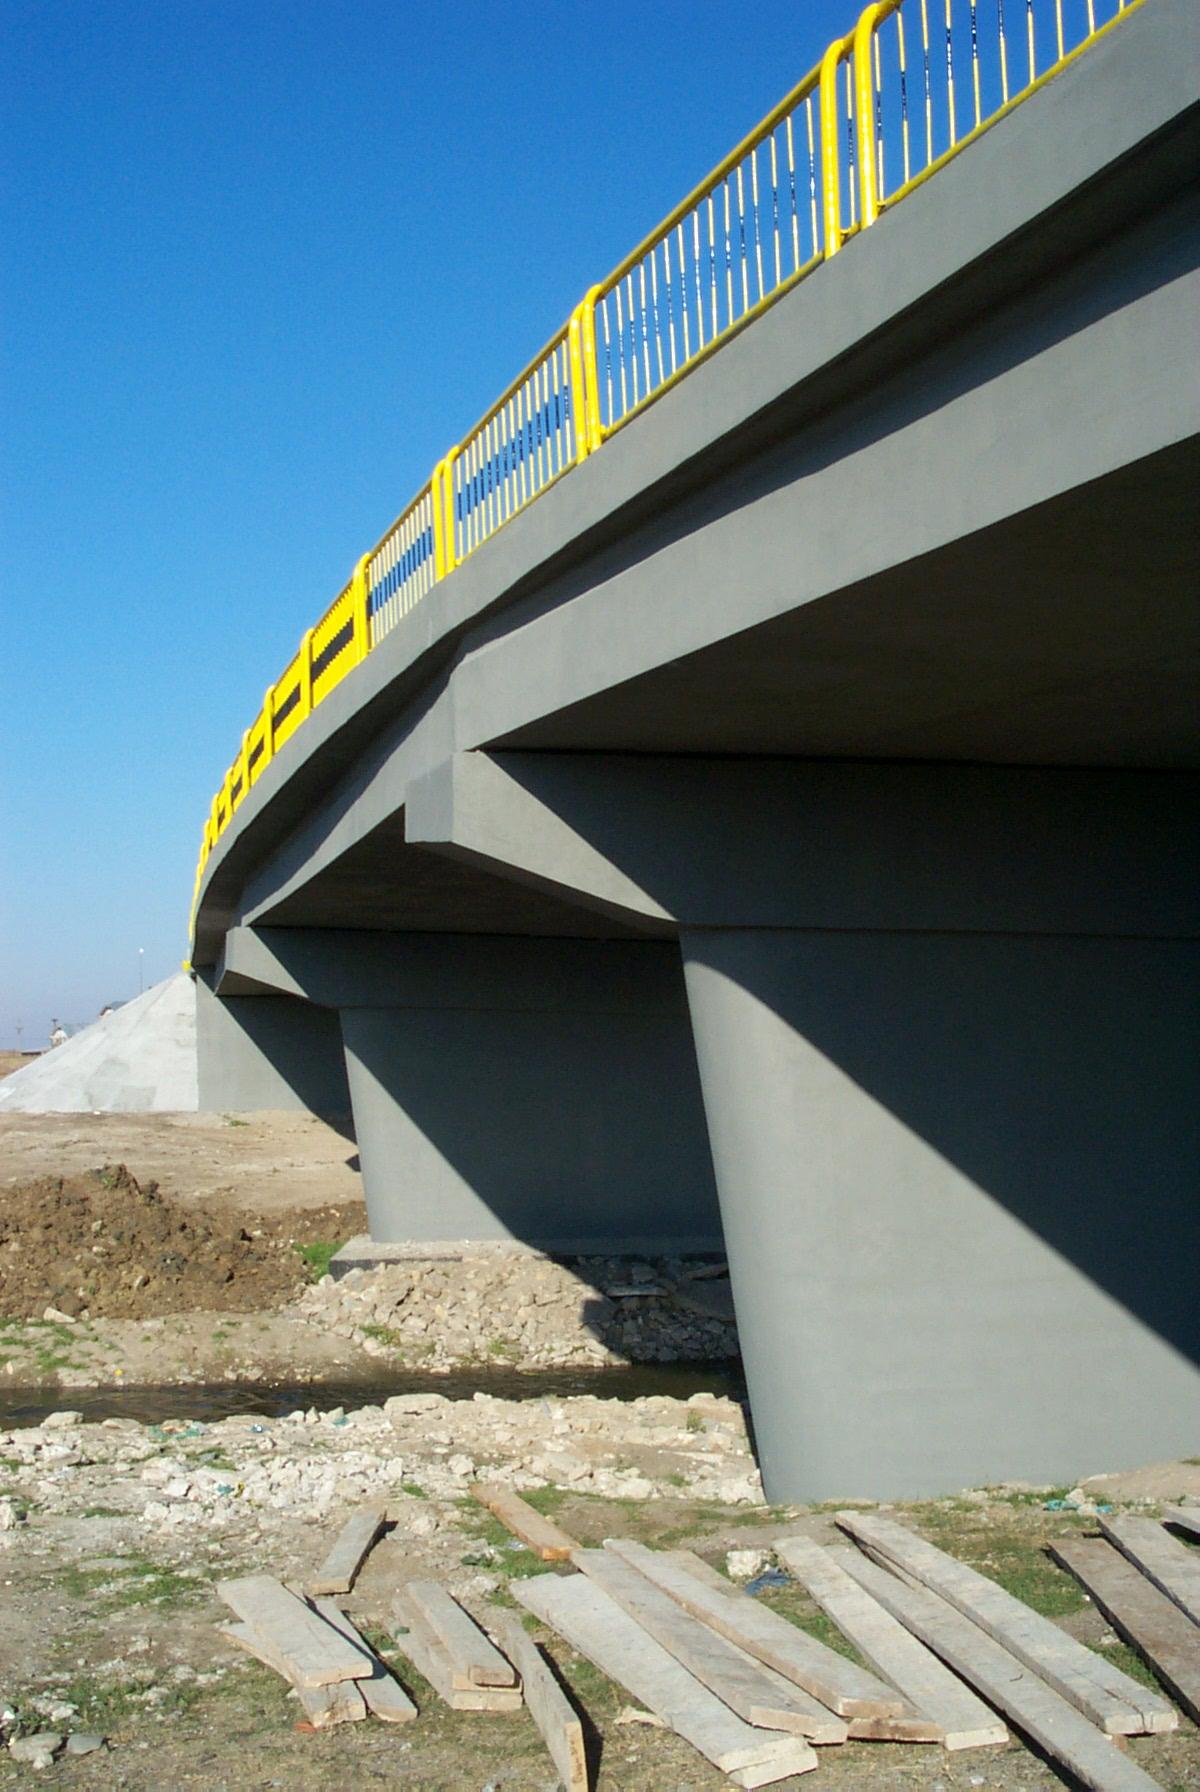 Reparatii pod (DN2), Km. 33 - 028, peste raul Calnistea MAPEI - Poza 17